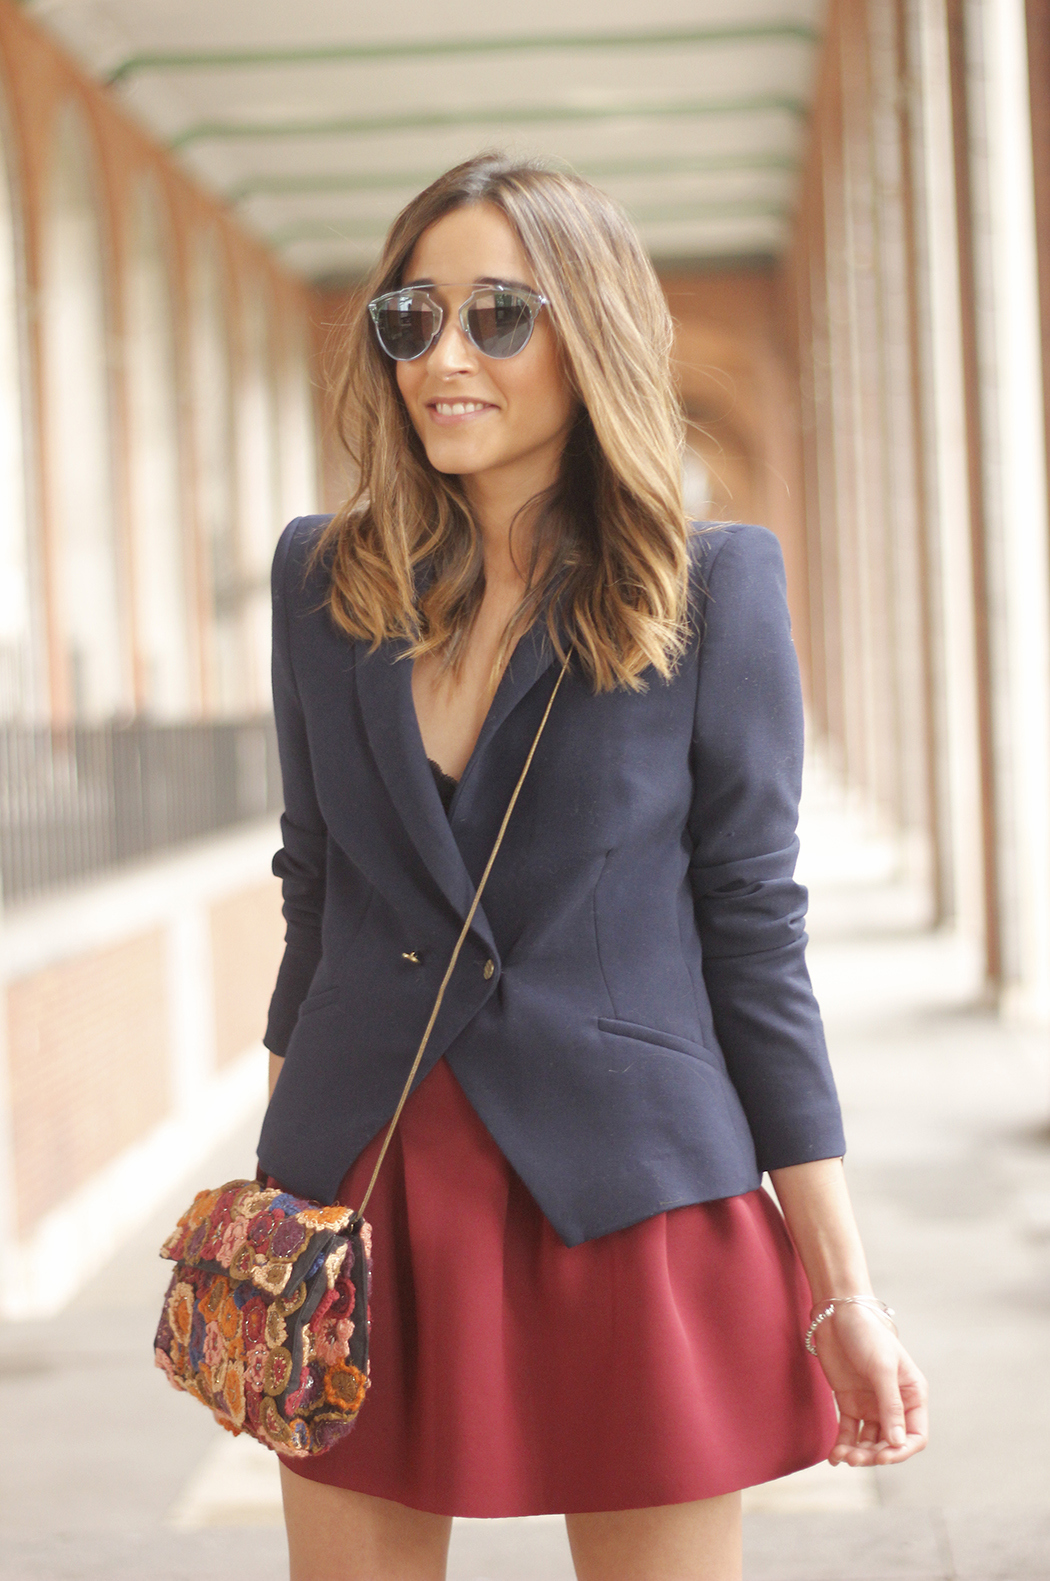 Blue Blazer Burgundy Skirt Outfit10